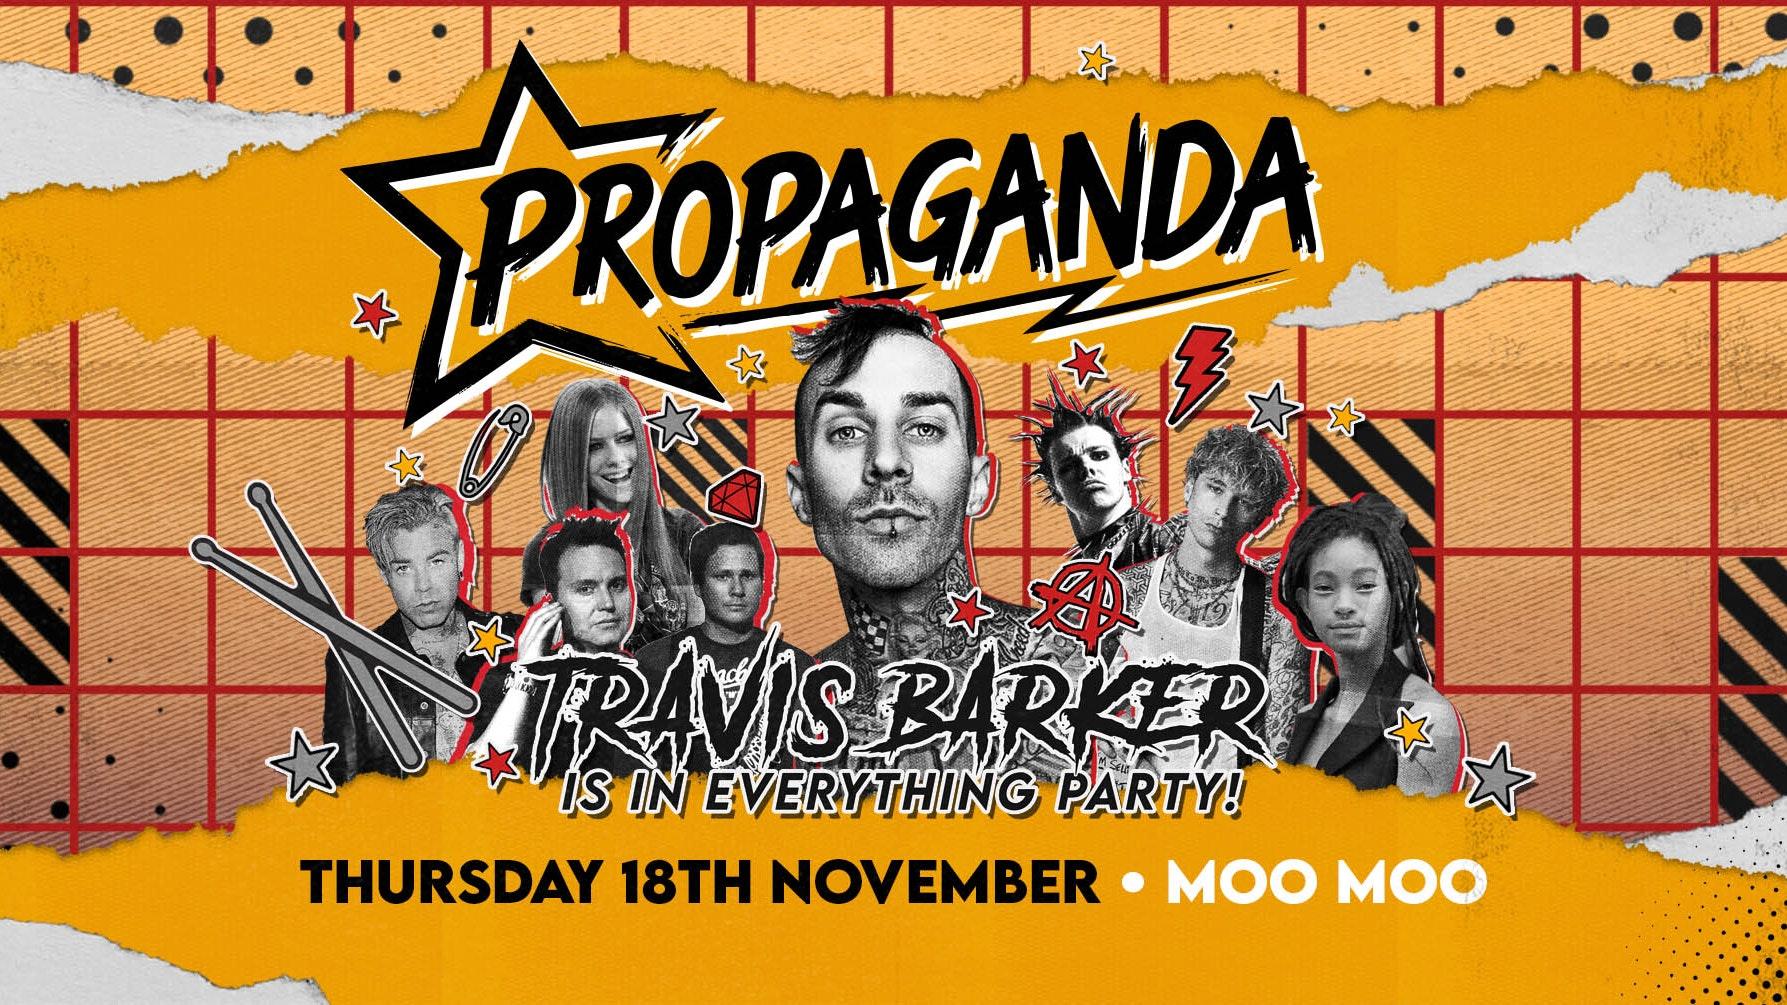 Propaganda Cheltenham- Travis Barker Is In Everything Party!